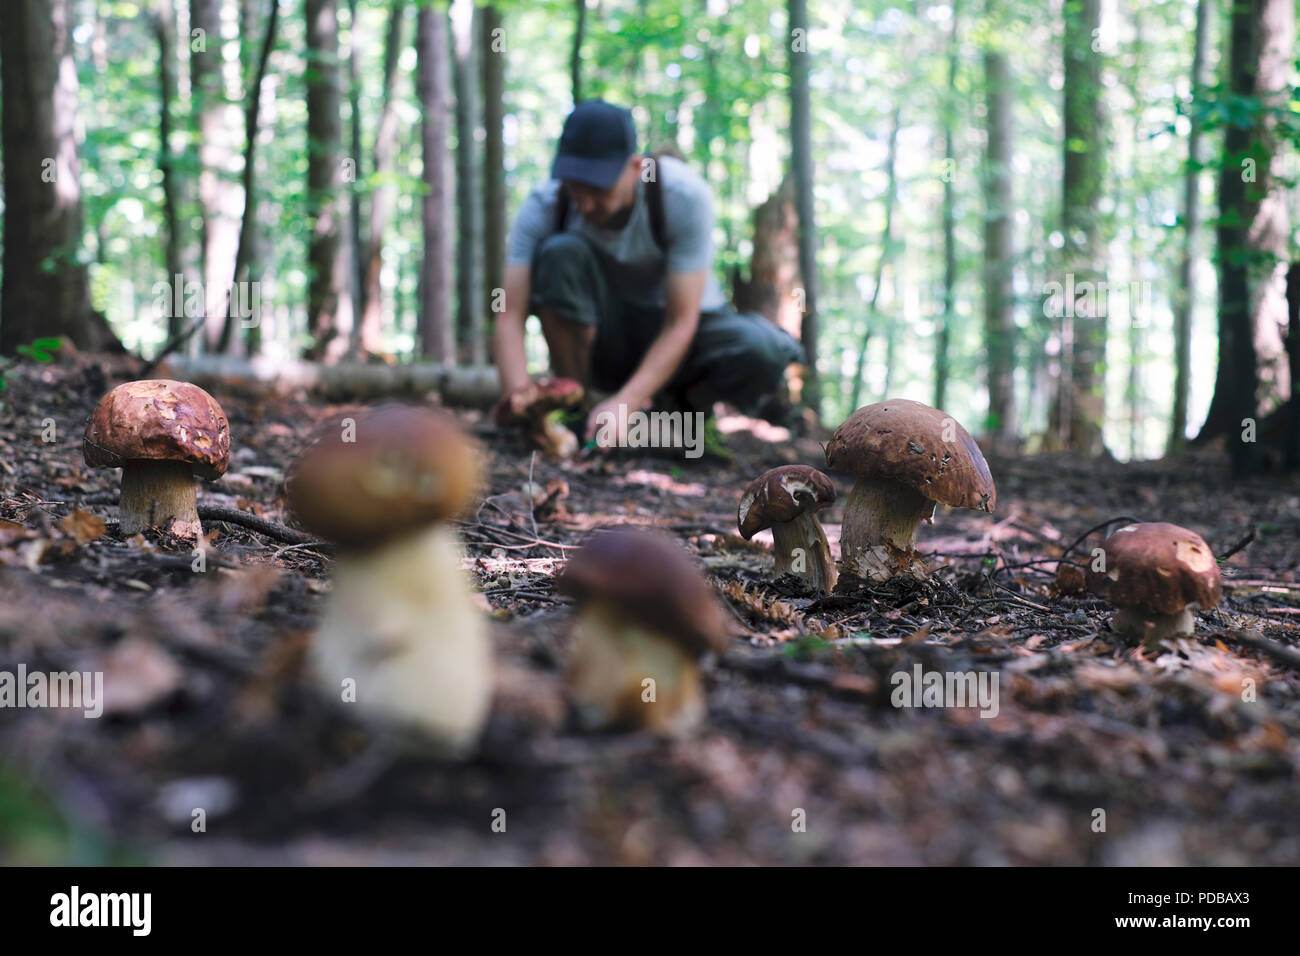 Man collect mushrooms - Stock Image